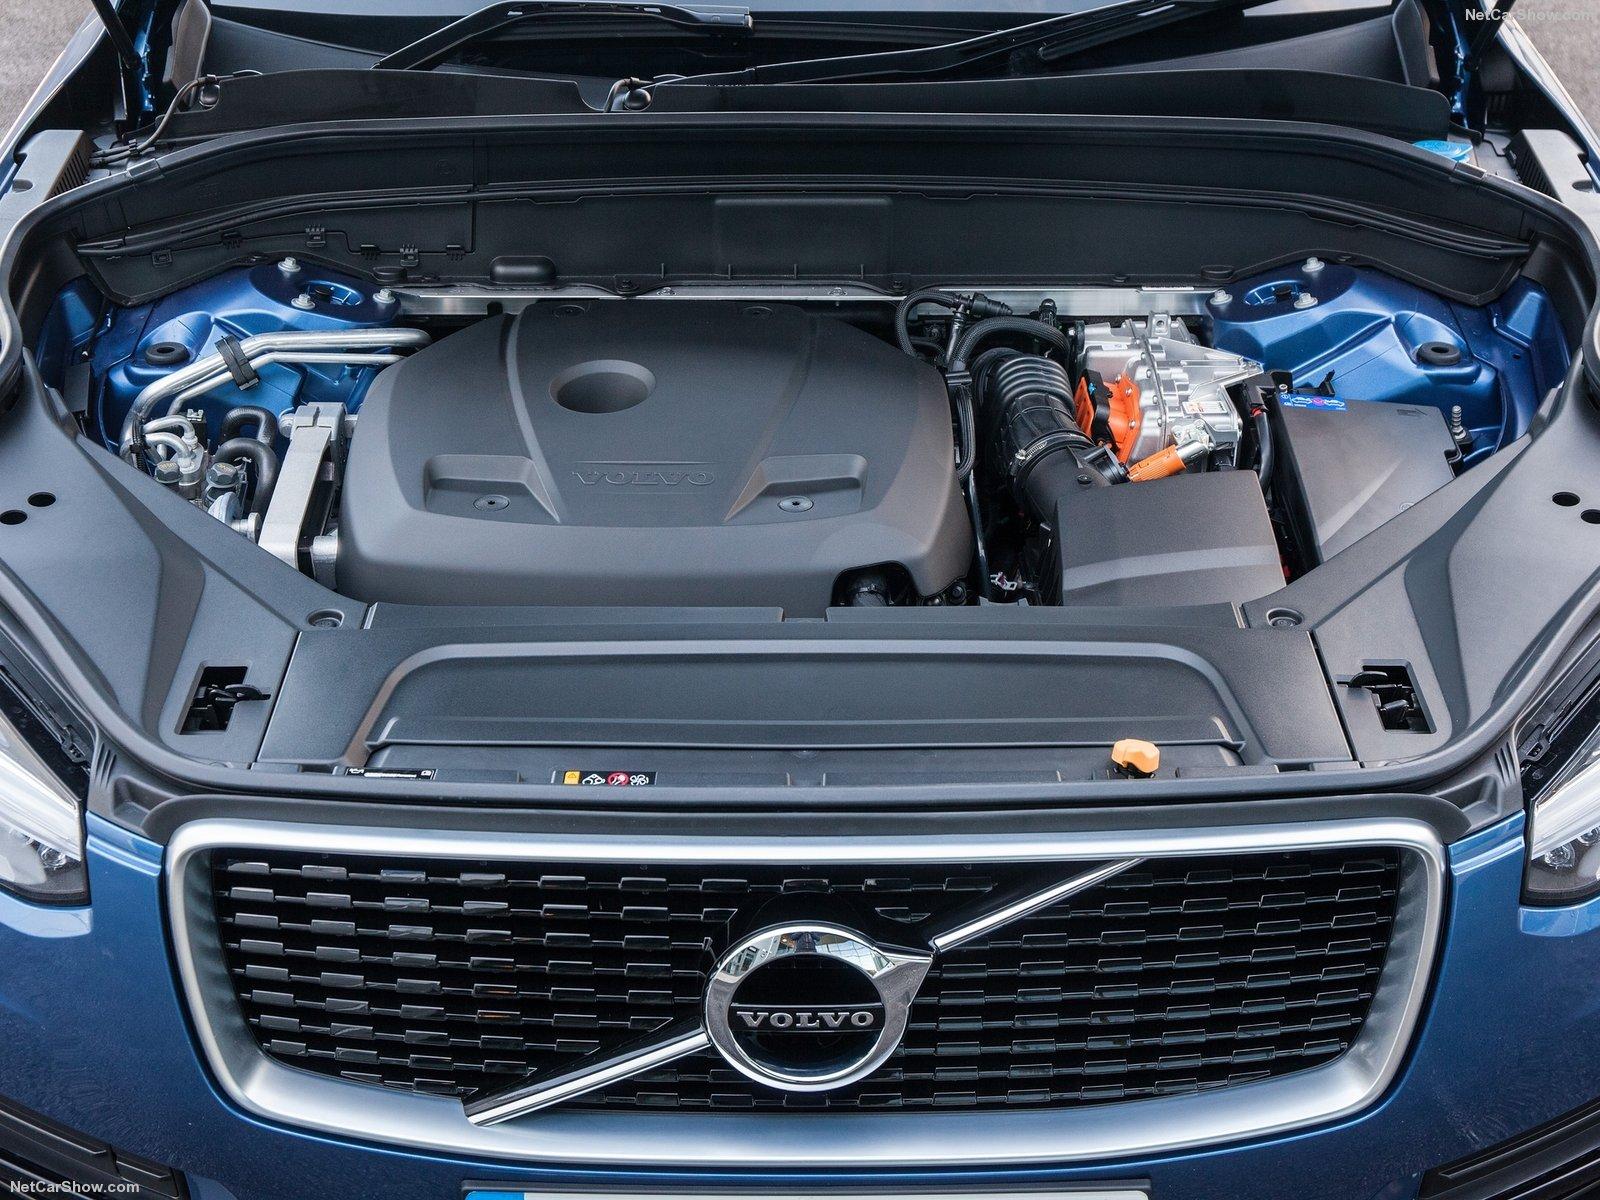 Volvo XC80 T8 Twin Engine